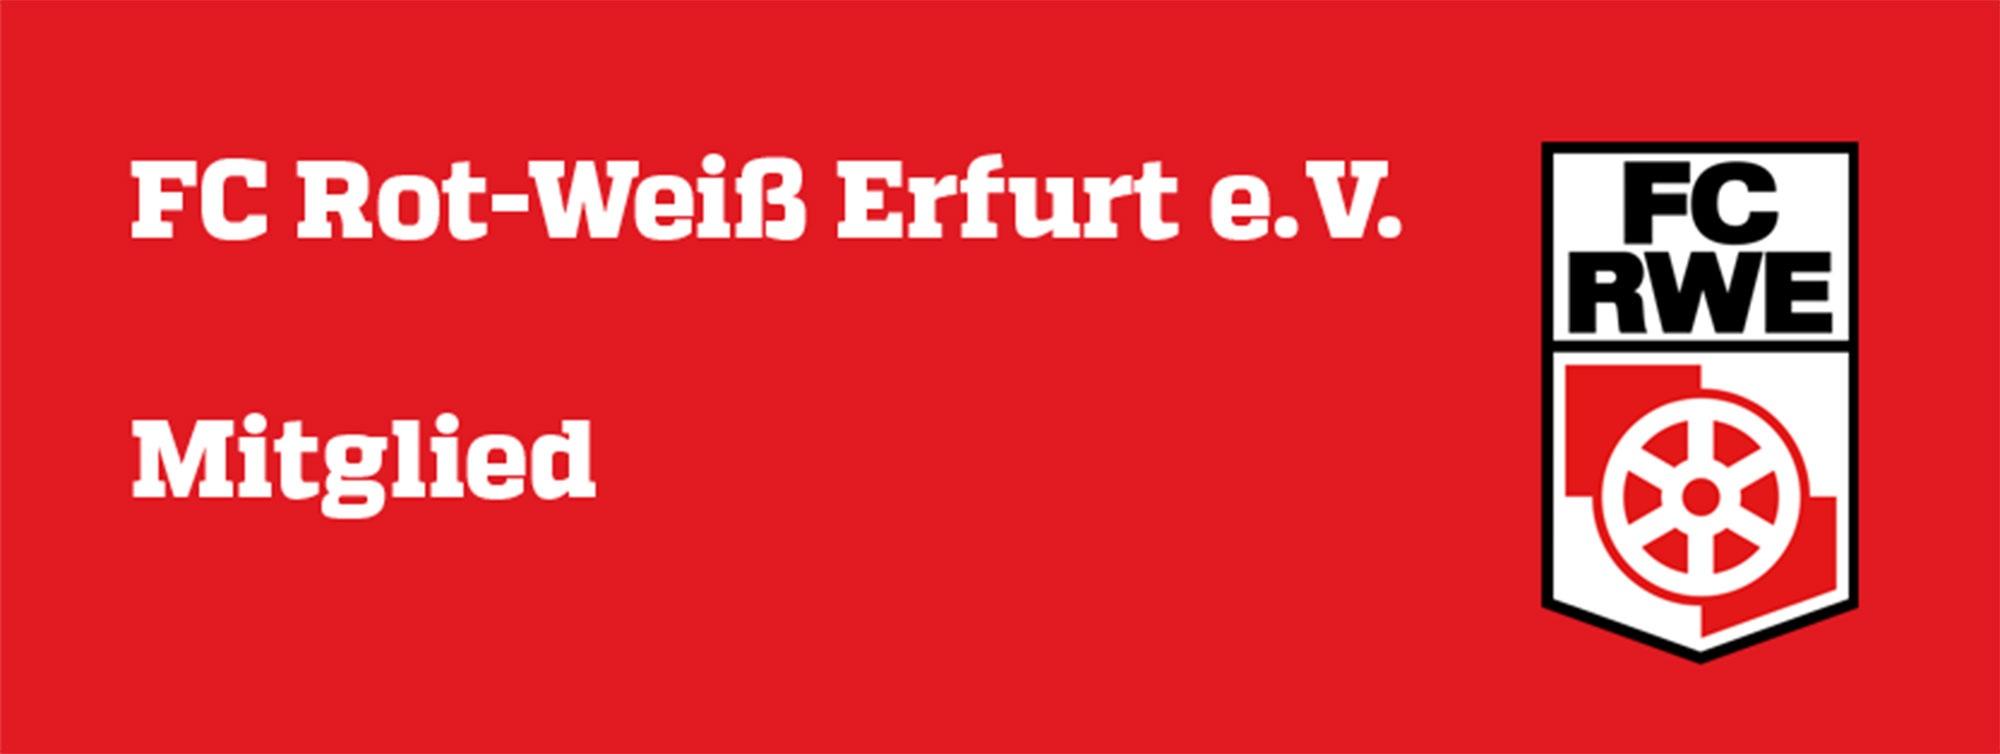 Mitgliederausweis-FC-RWE-eV_Stand-2021_Entwurf-1.jpg